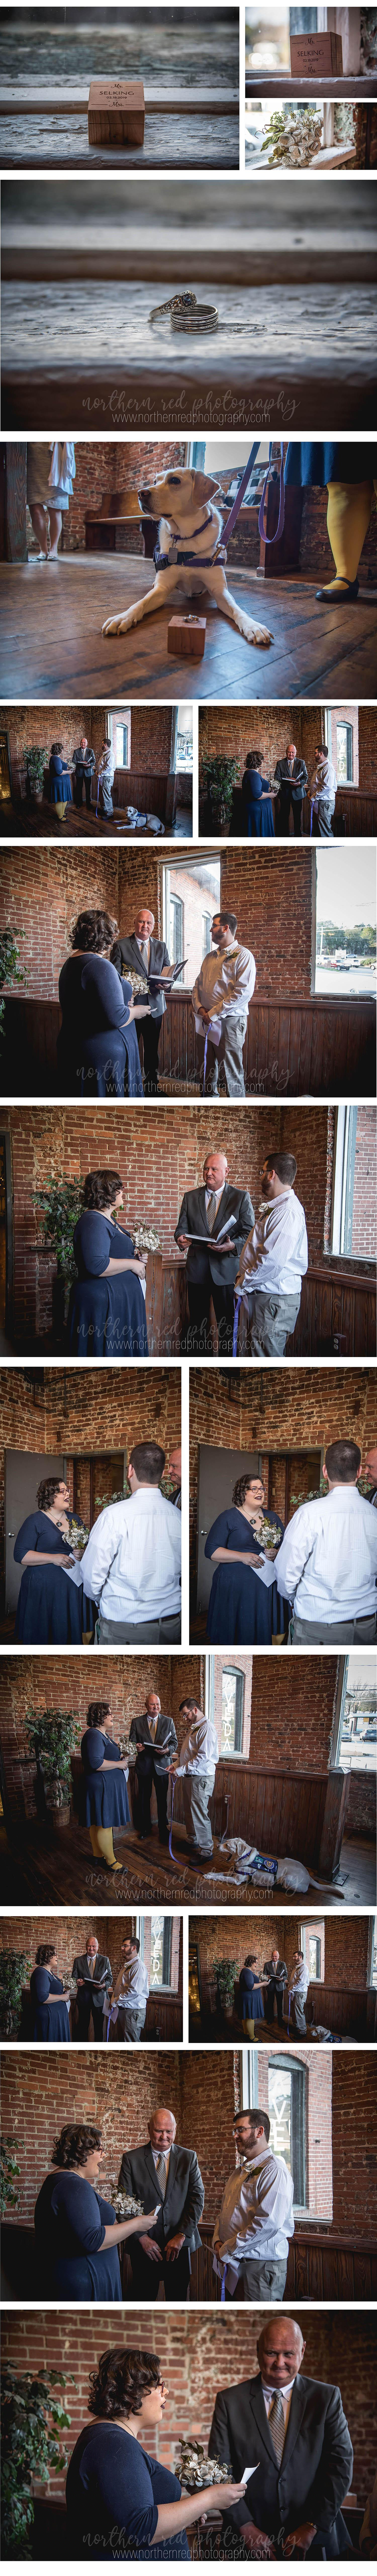 Northern Red Photography | South Carolina Wedding Photographer